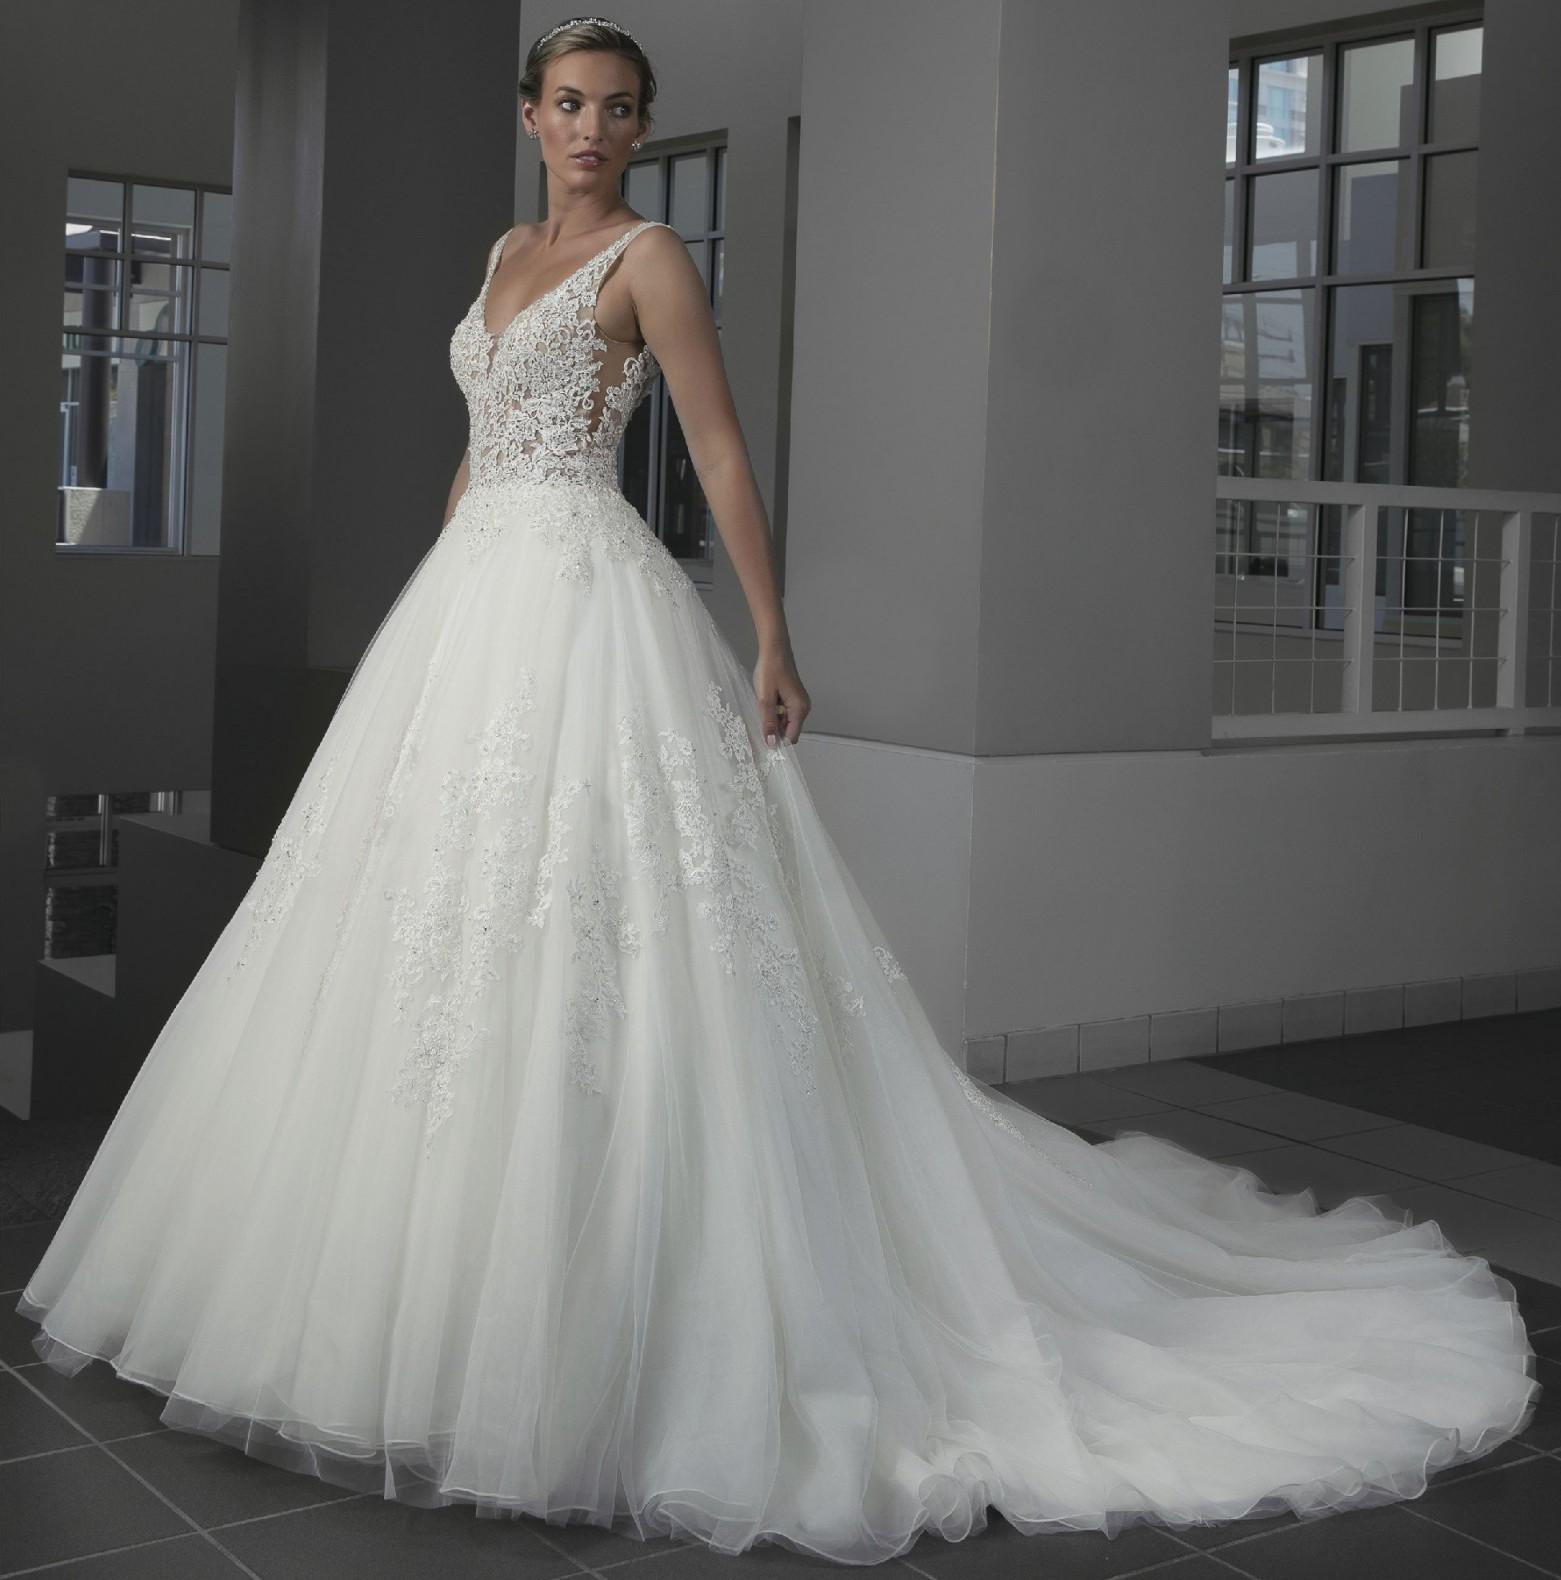 Cheap Wedding Dresses Madison Wi: 17653 New Wedding Dress On Sale 47